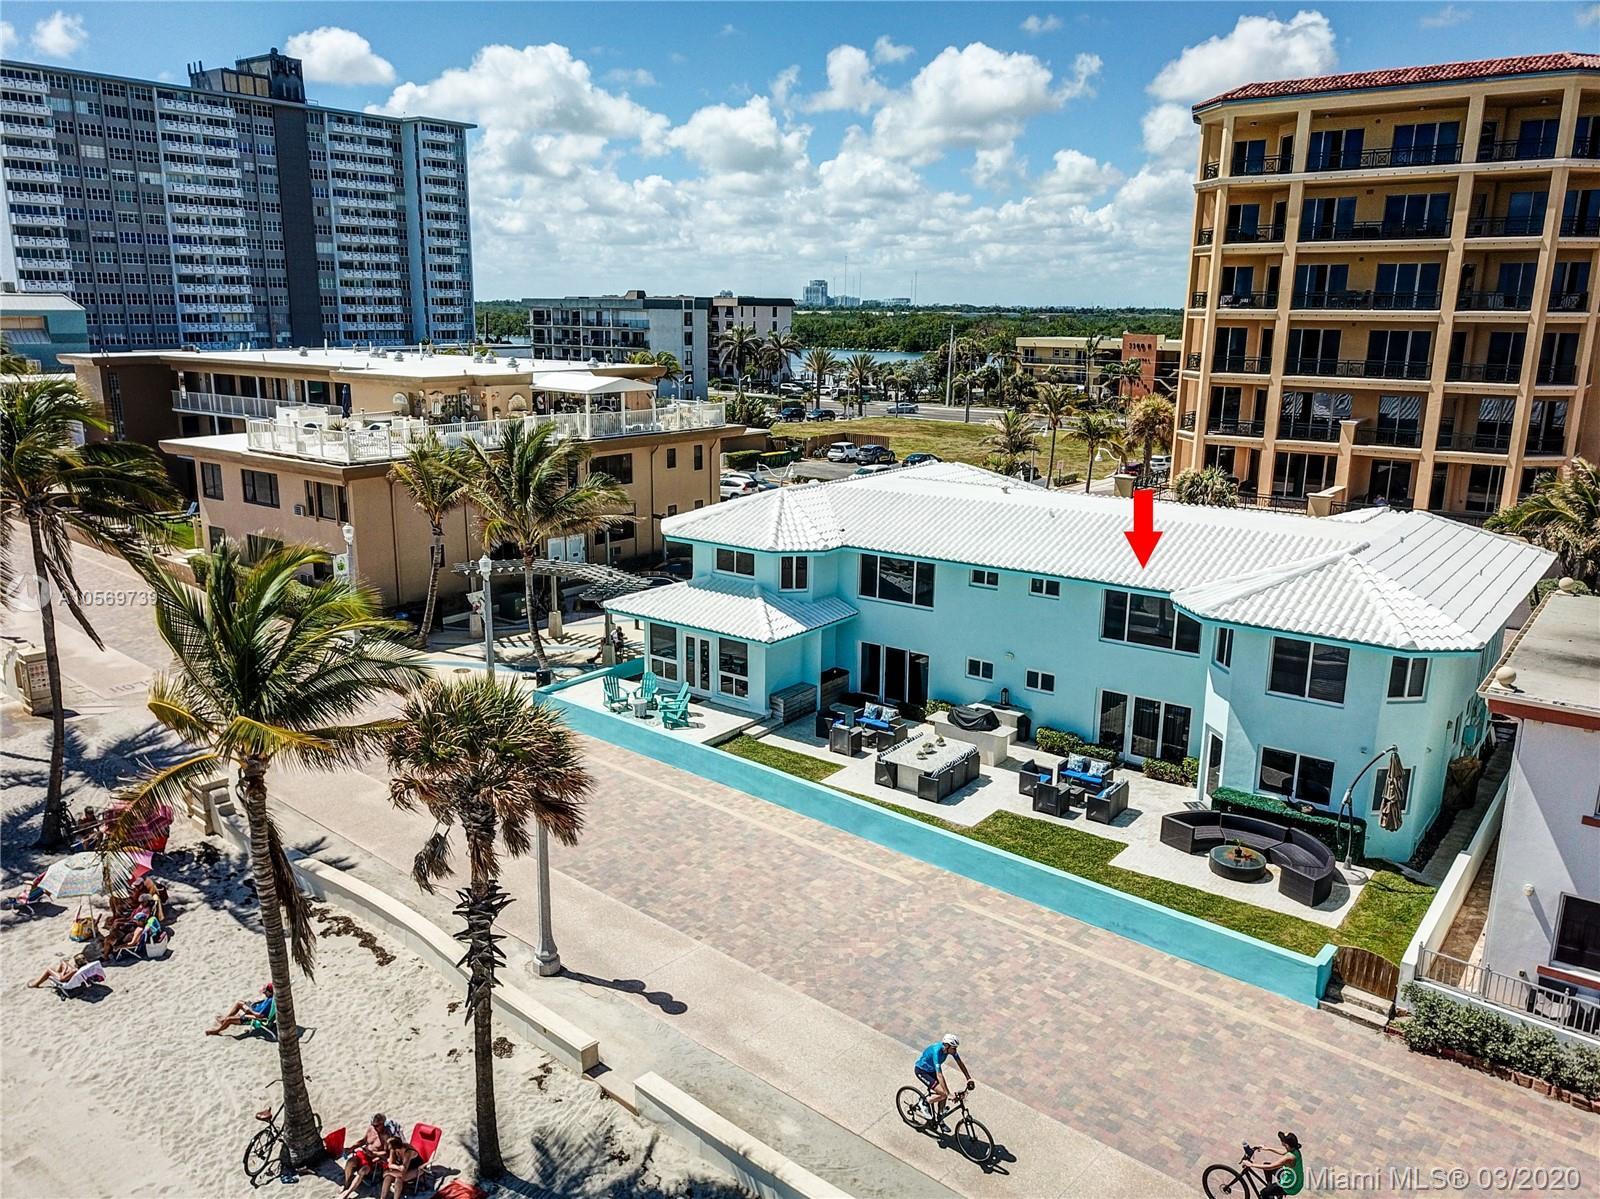 3400 N SURF ROAD # 4, Hollywood, Florida 33019, 1 Bedroom Bedrooms, ,1 BathroomBathrooms,Residential Lease,For Rent,3400 N SURF ROAD # 4,A10569739